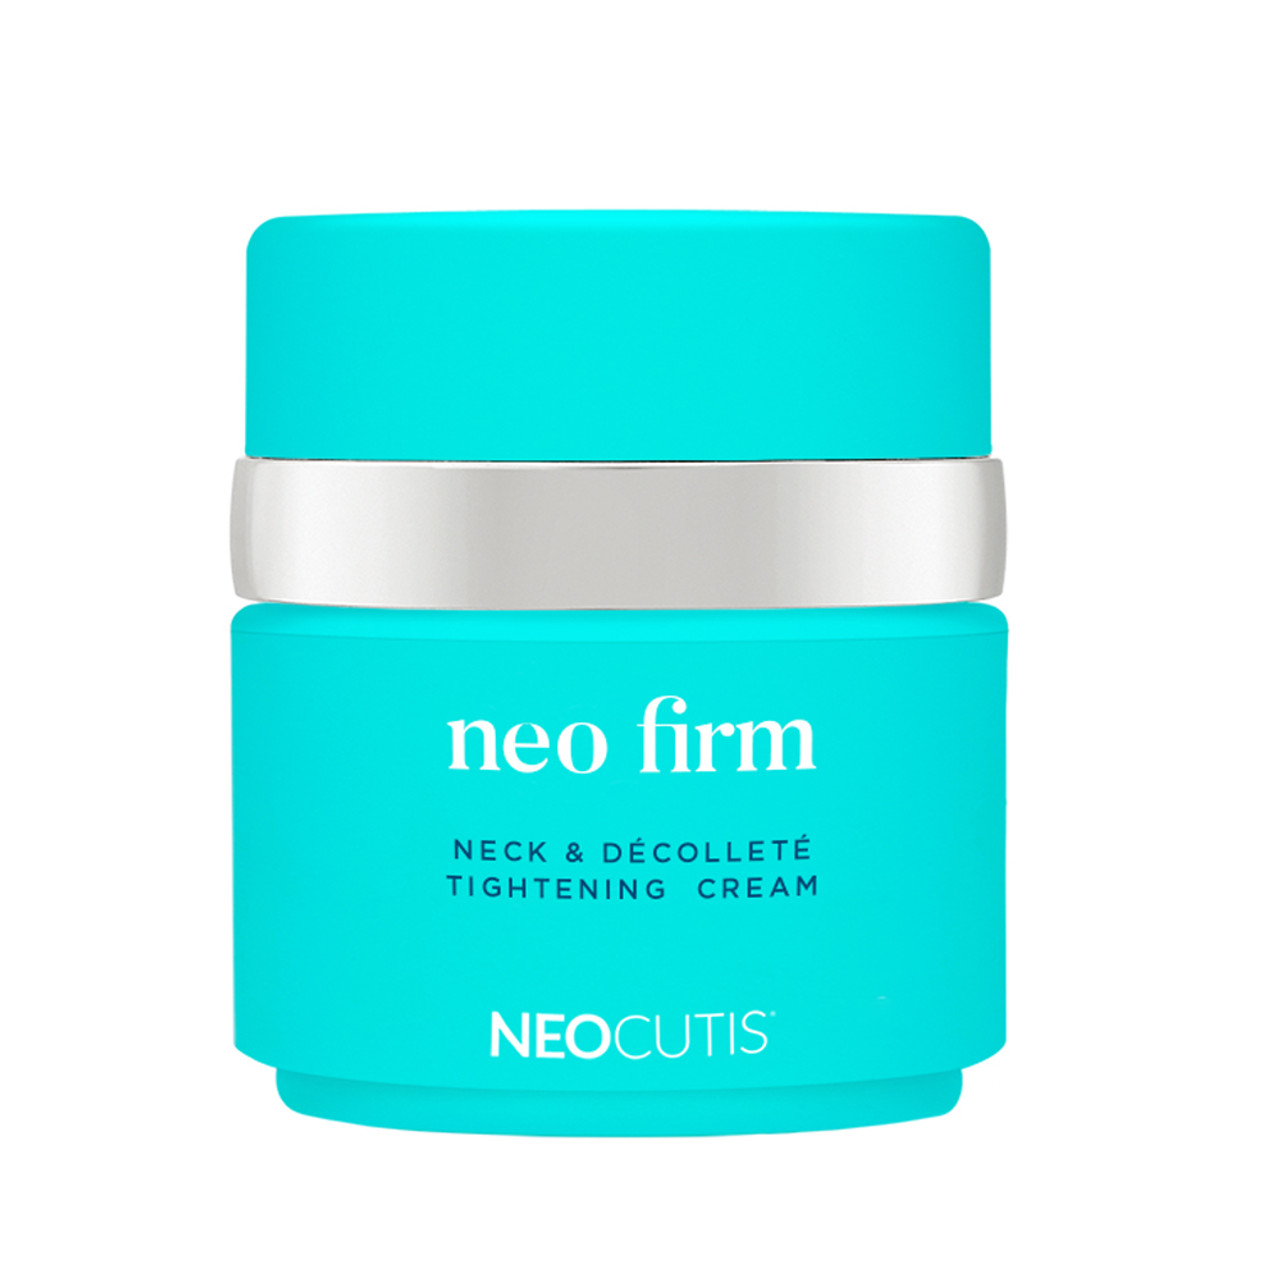 Neocutis NEO-FIRM Neck and Decollete Tightening Cream BeautifiedYou.com